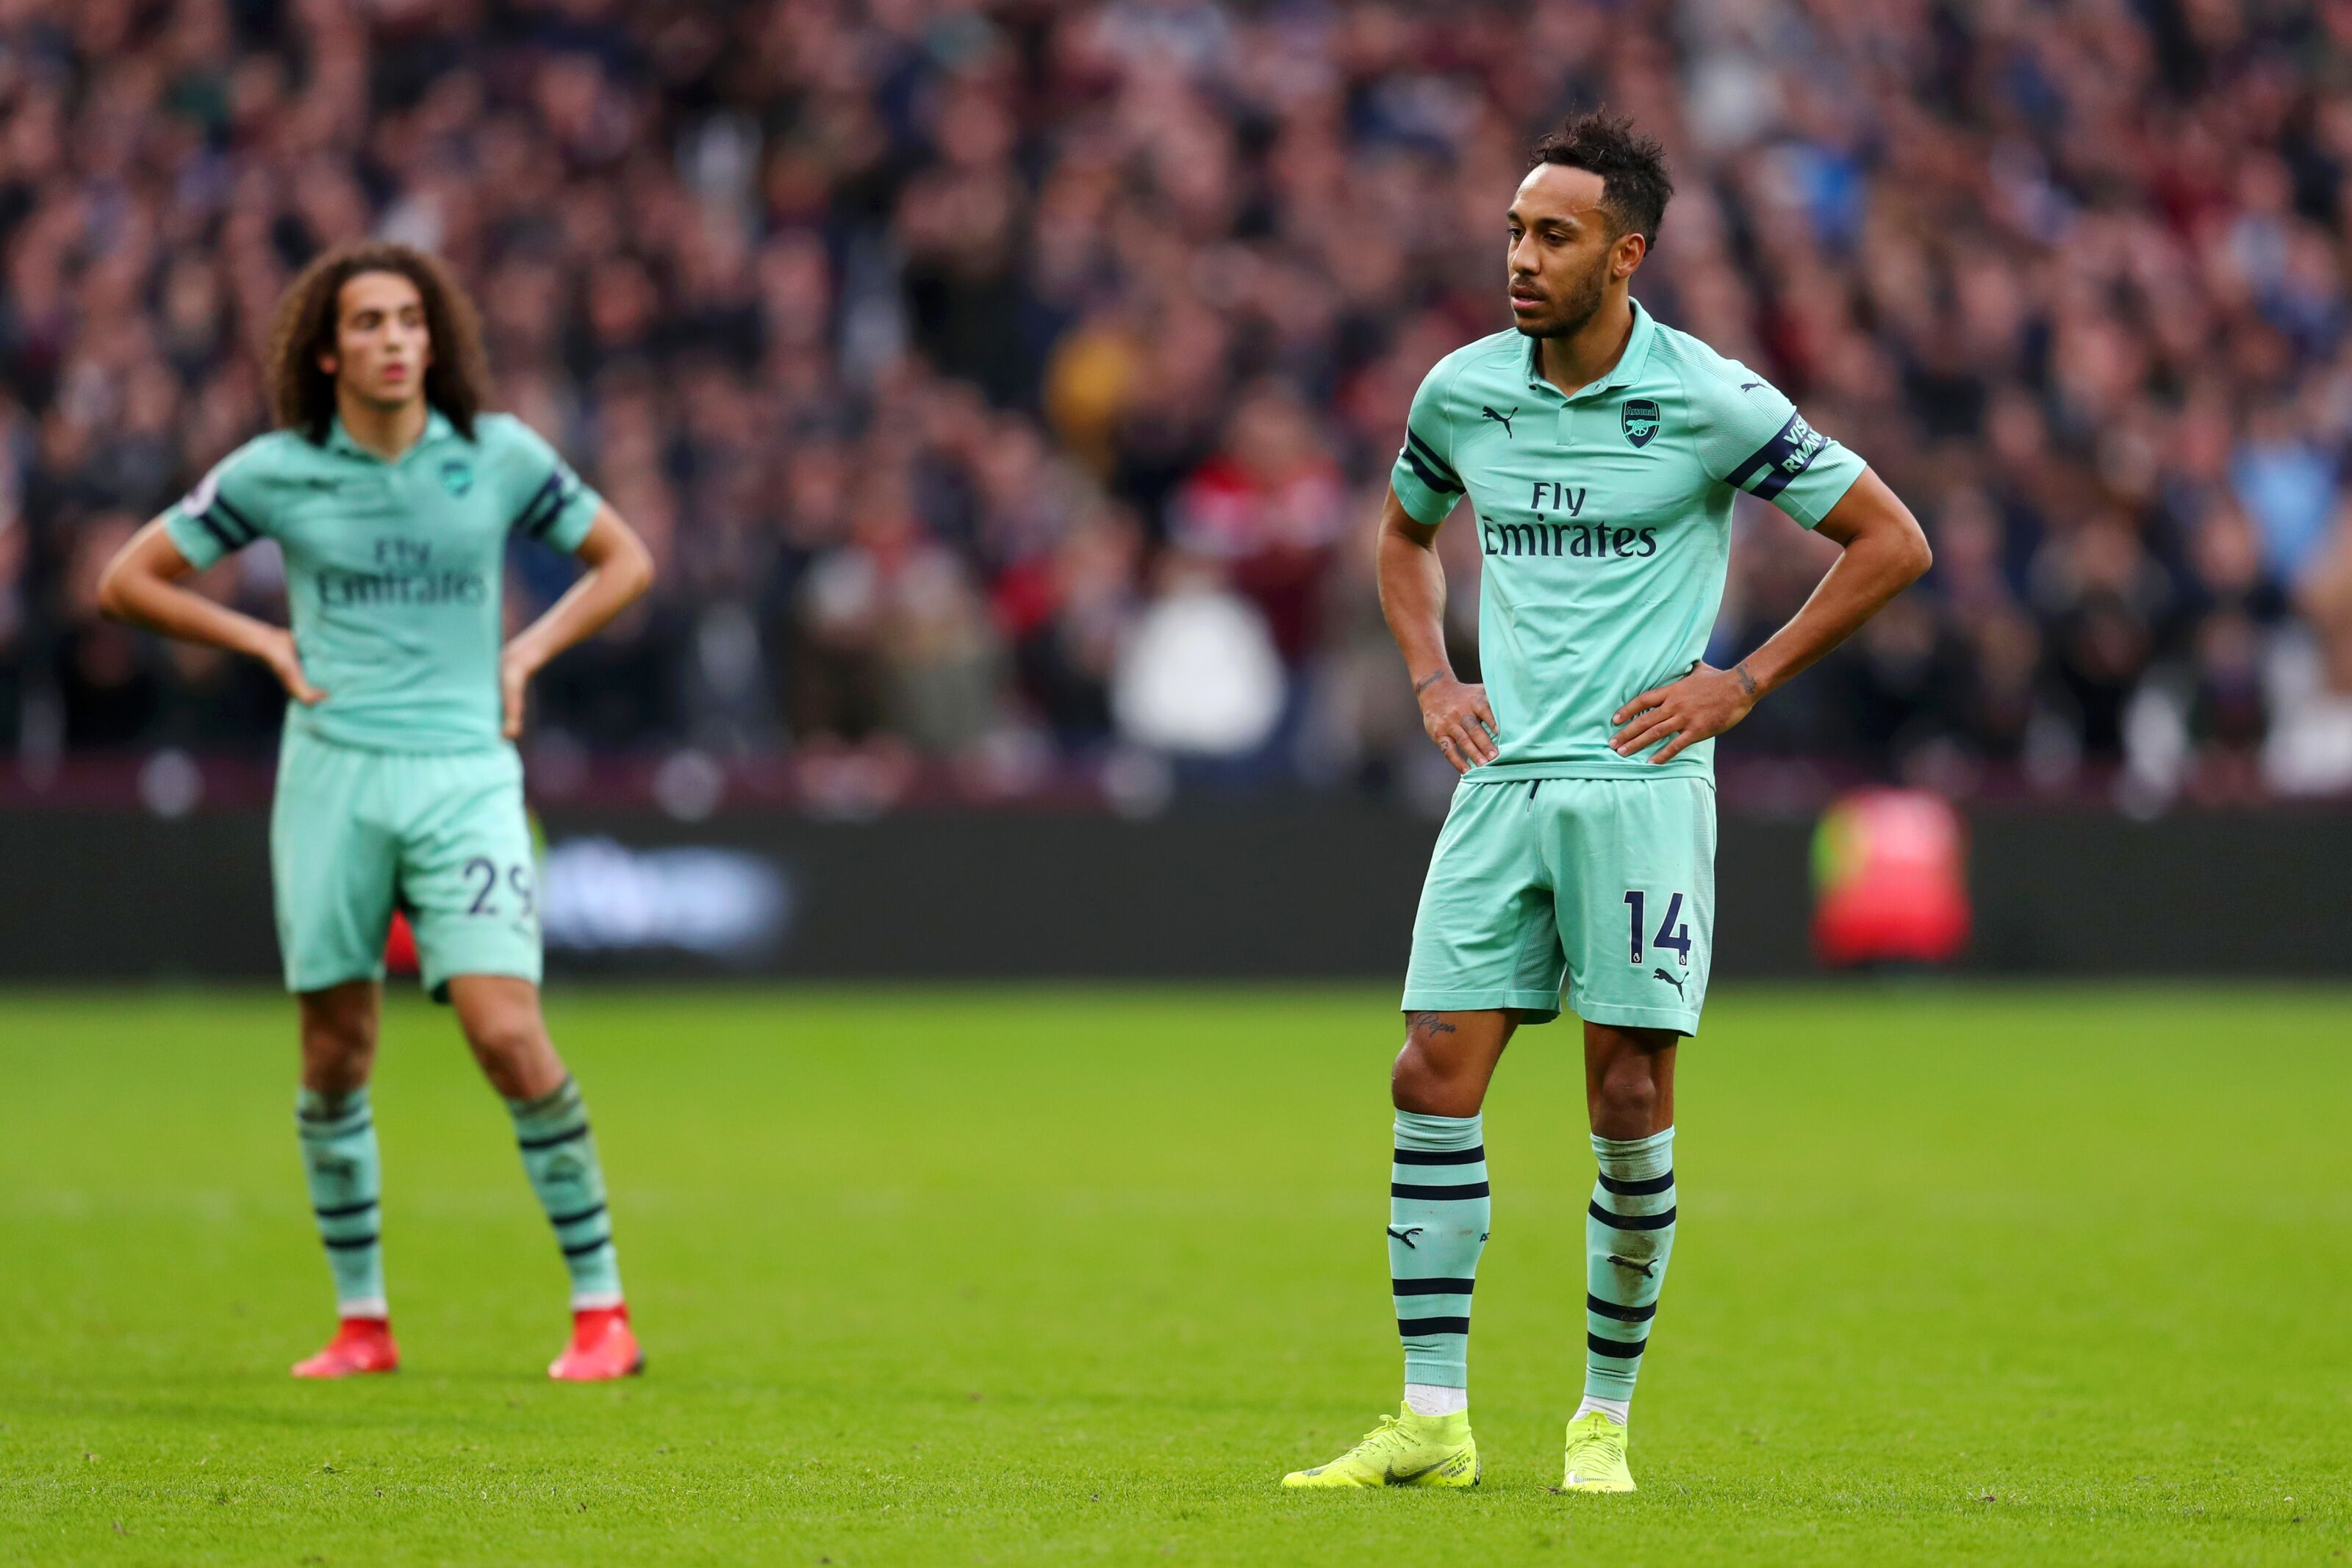 Arsenal: Is Pierre-Emerick Aubameyang another Mesut Ozil?